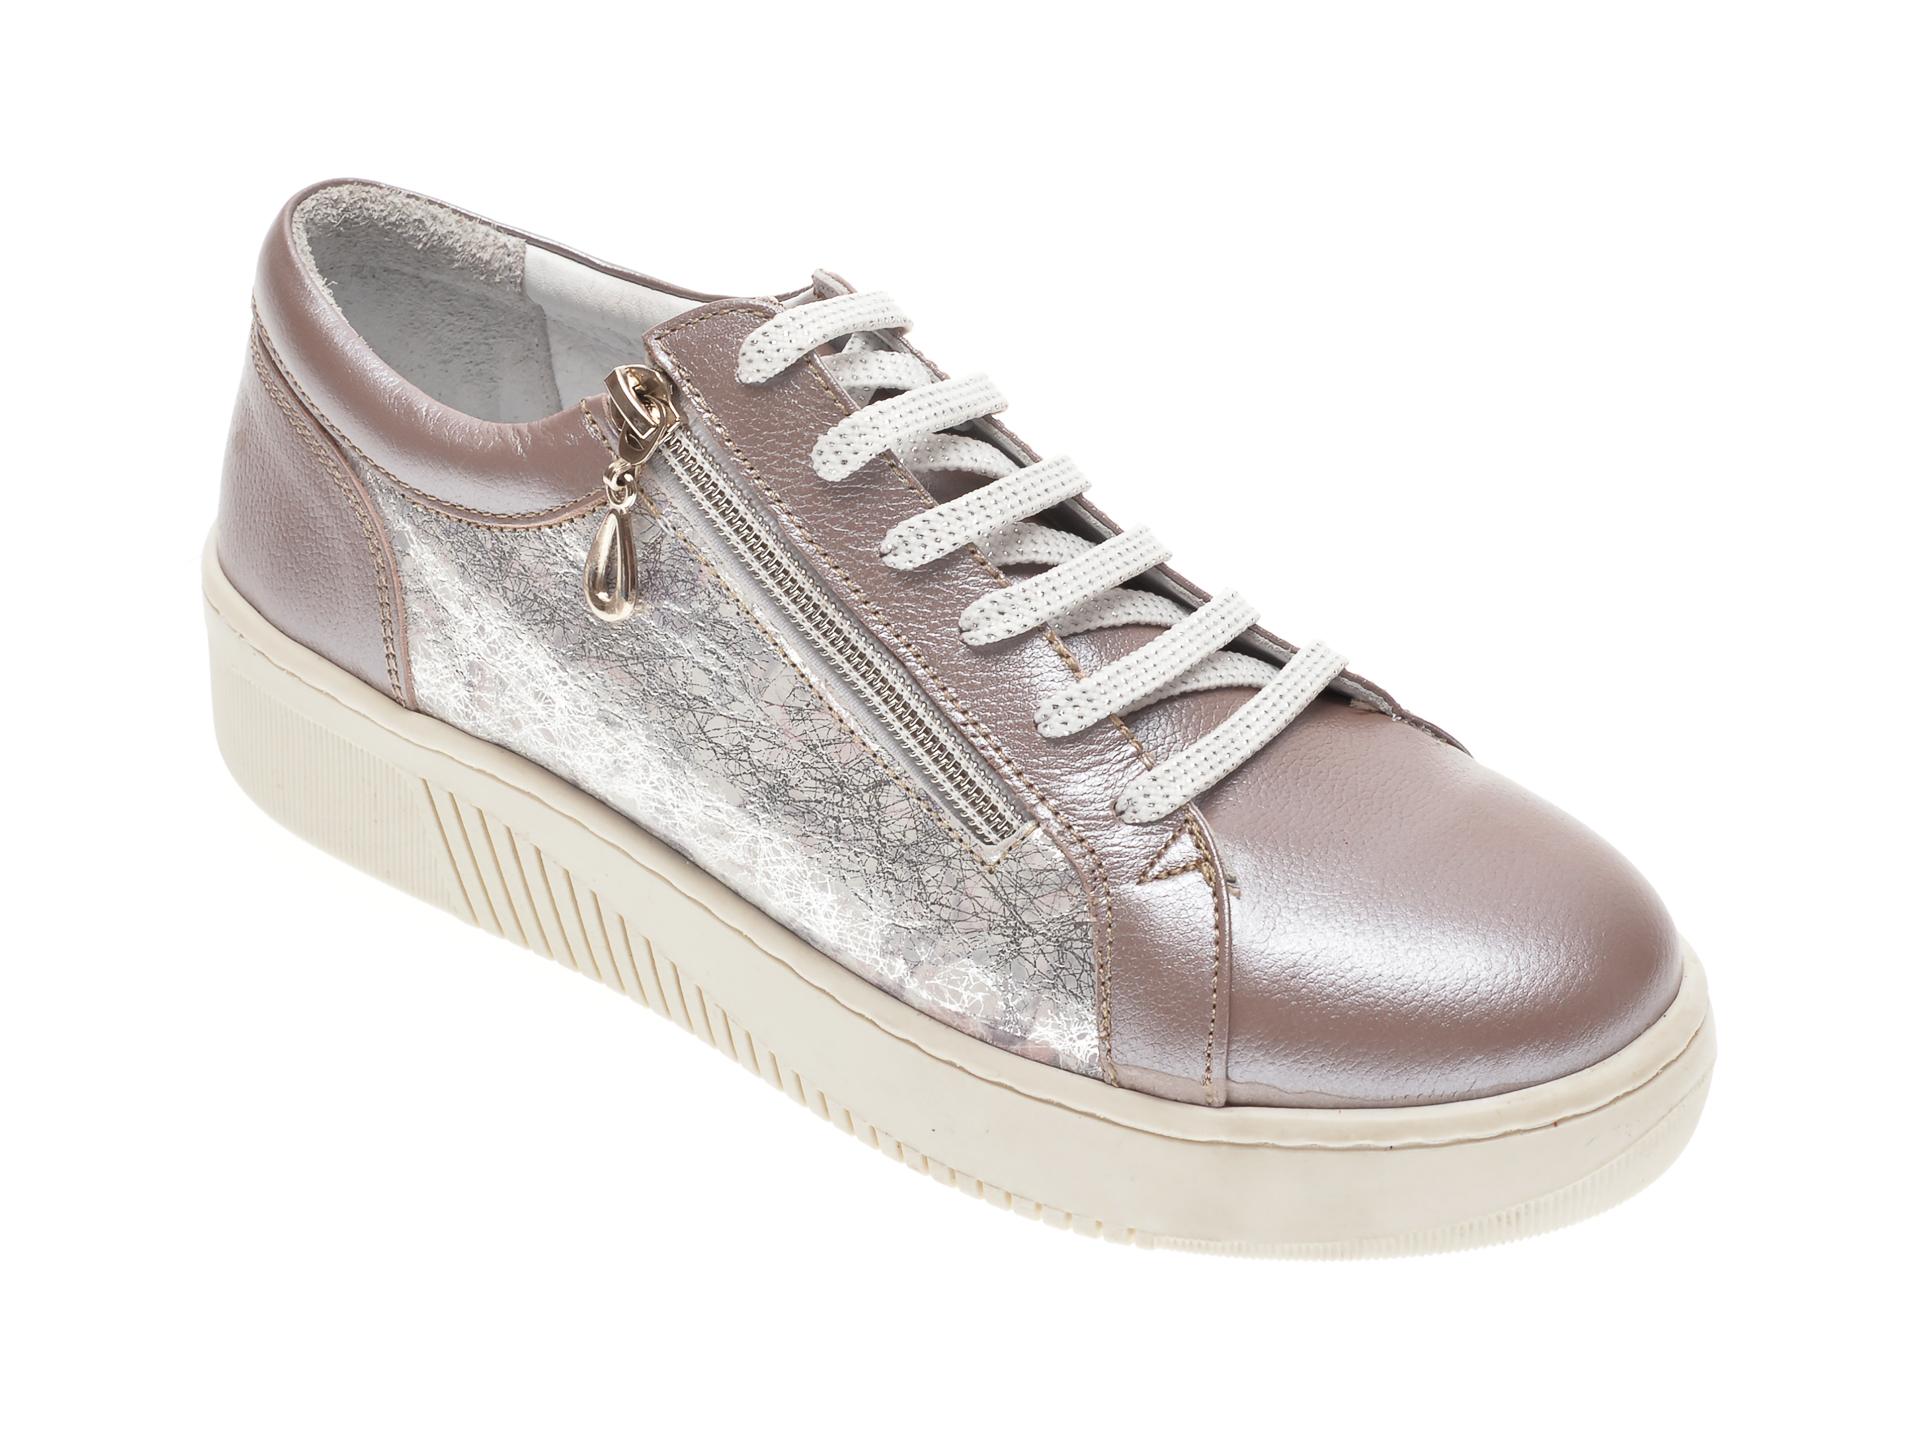 Pantofi LUMEL gri, 495, din piele naturala